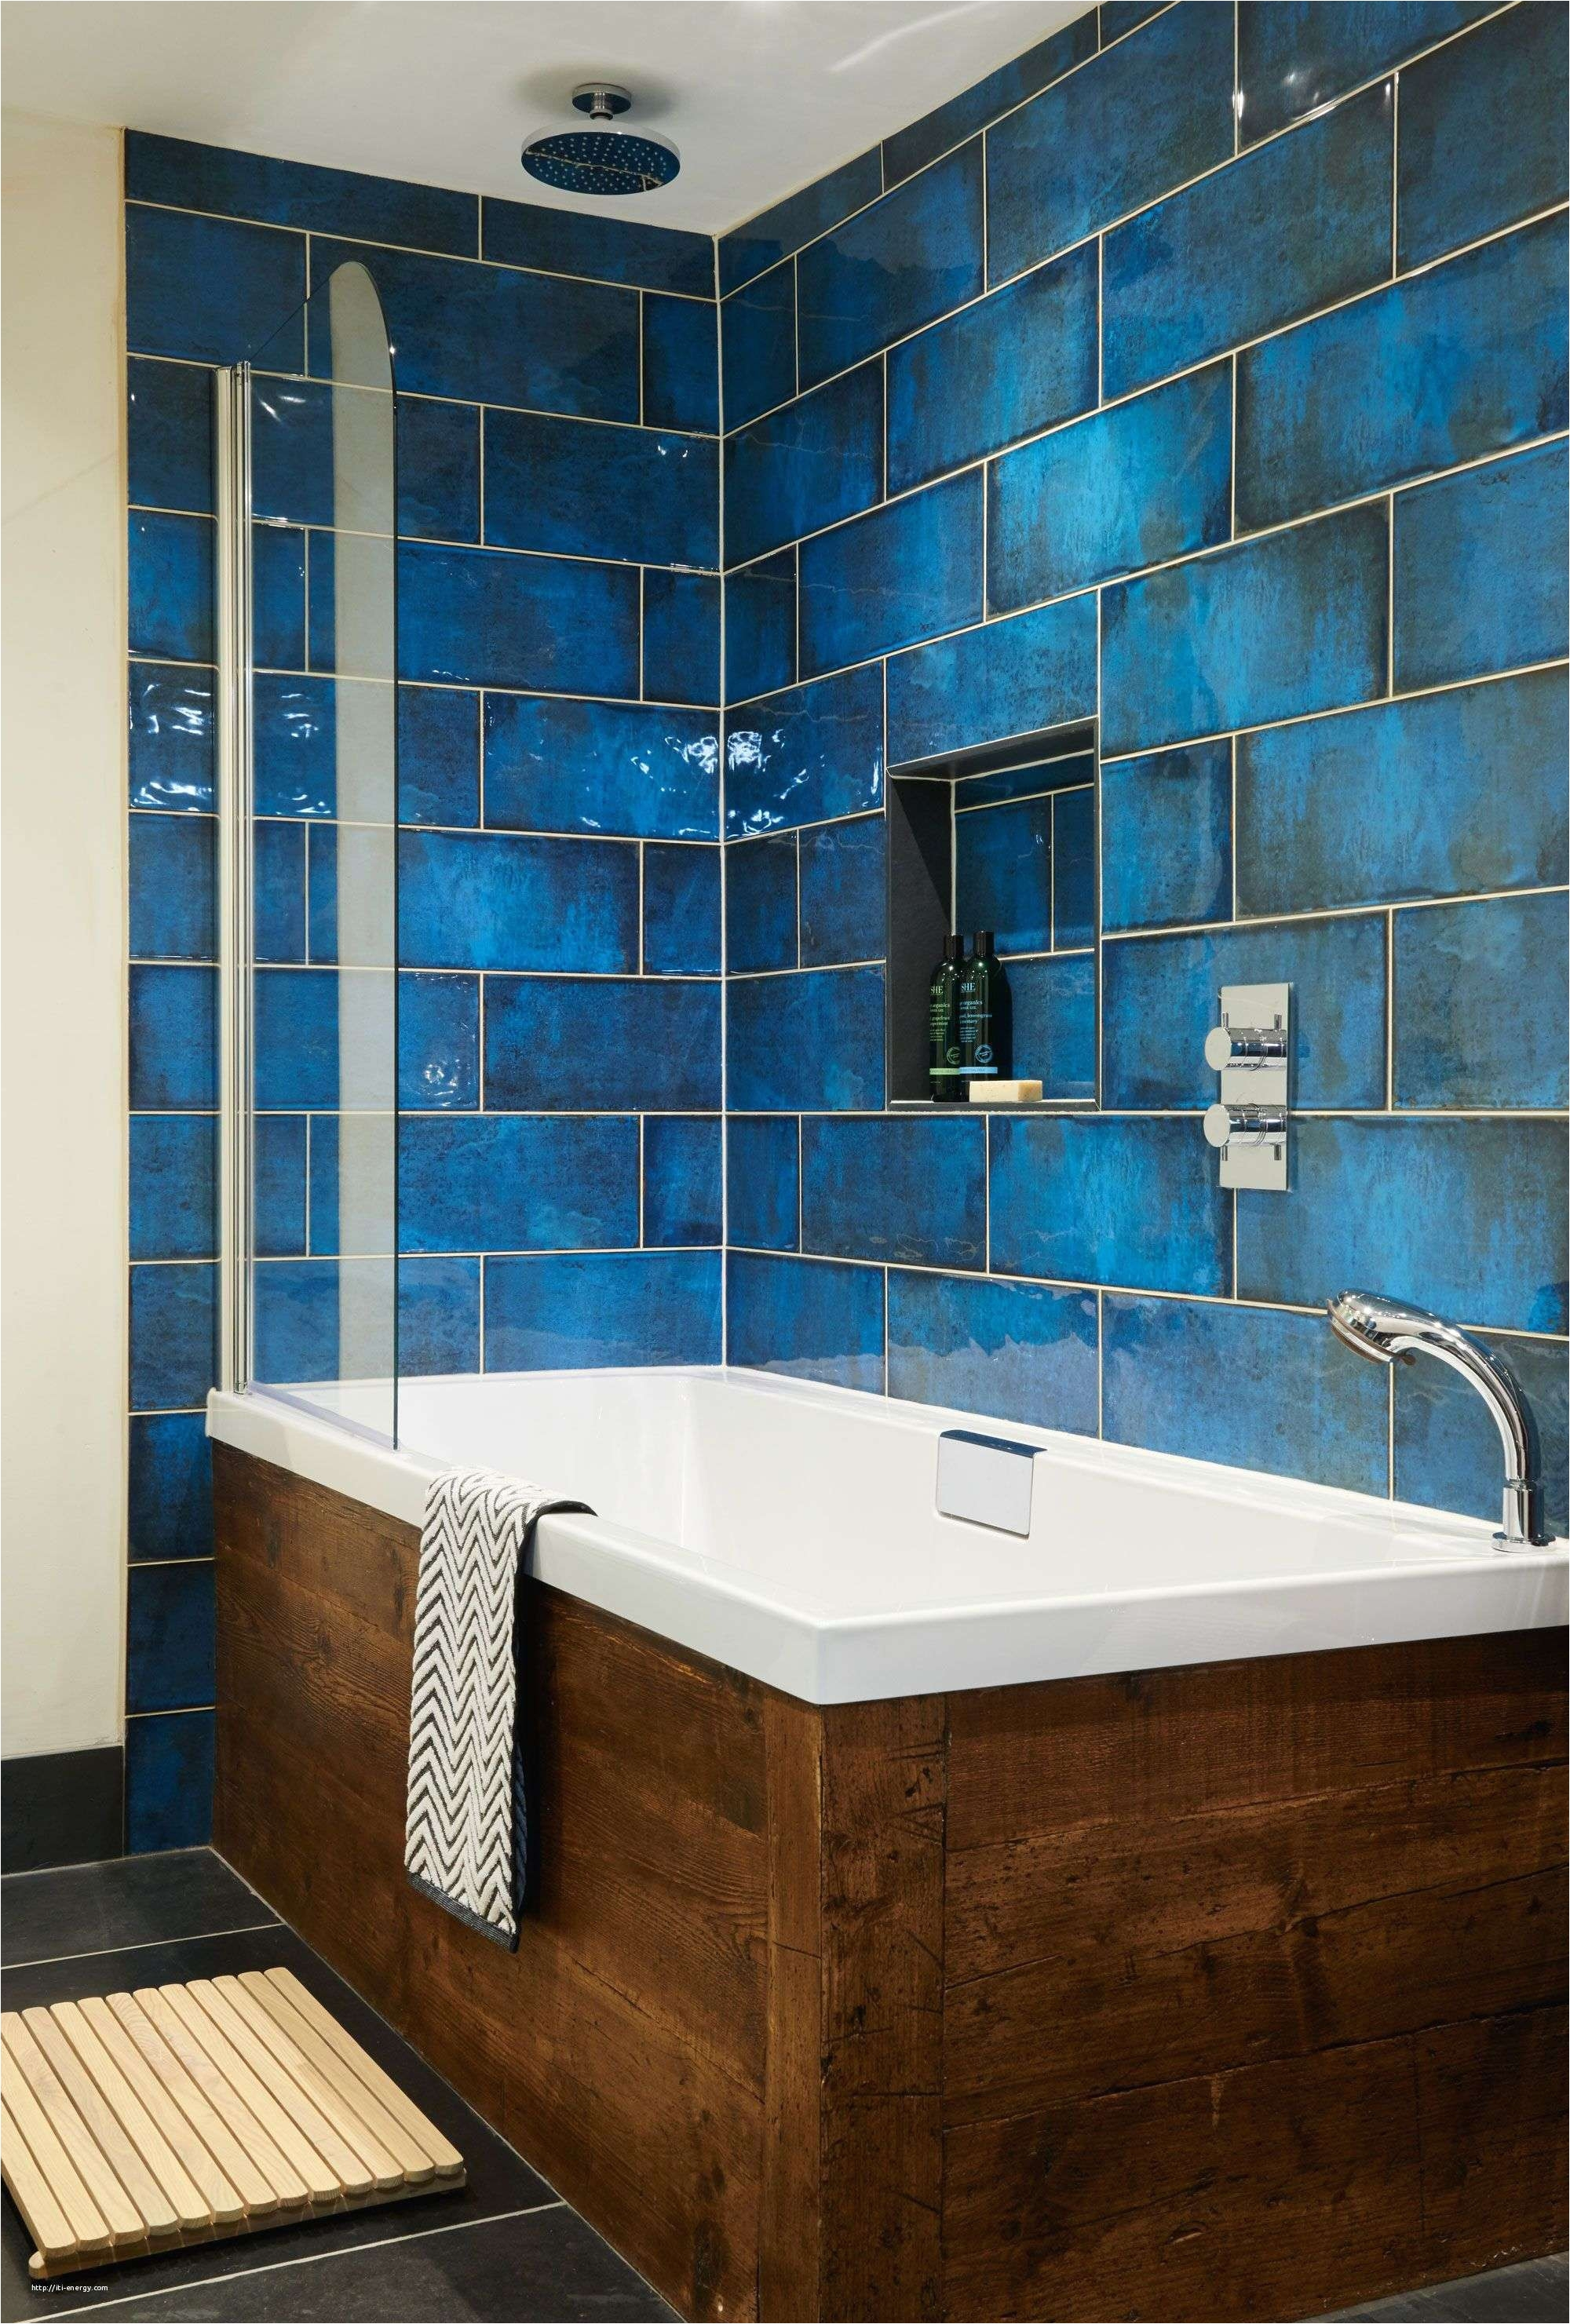 Bathroom Design Ideas for Small Spaces Nice Bathroom Designs for Small Spaces Inspirational Awesome